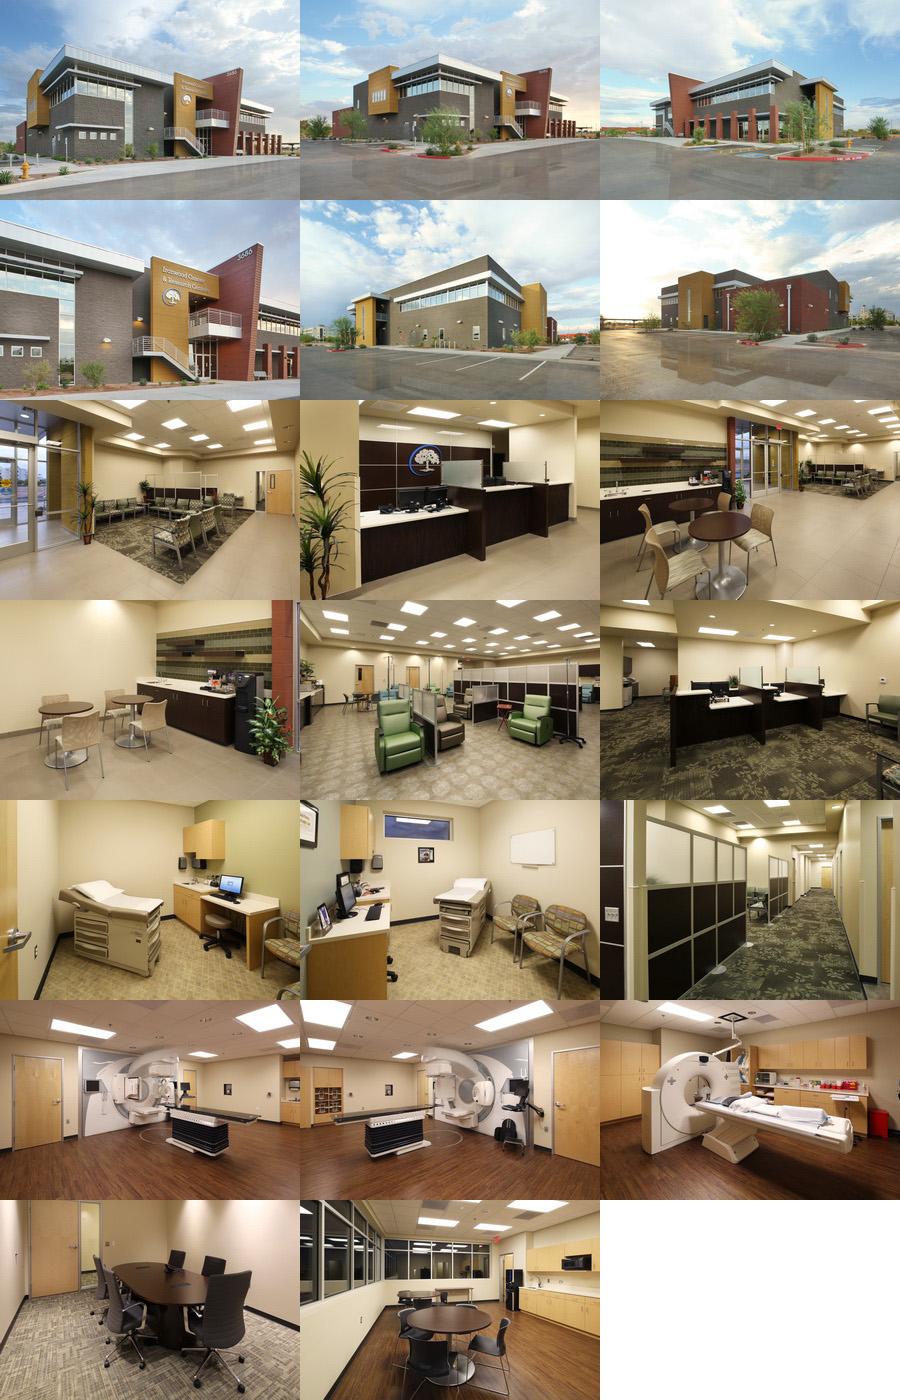 ironwood-research-center--gilbert-thumbnail